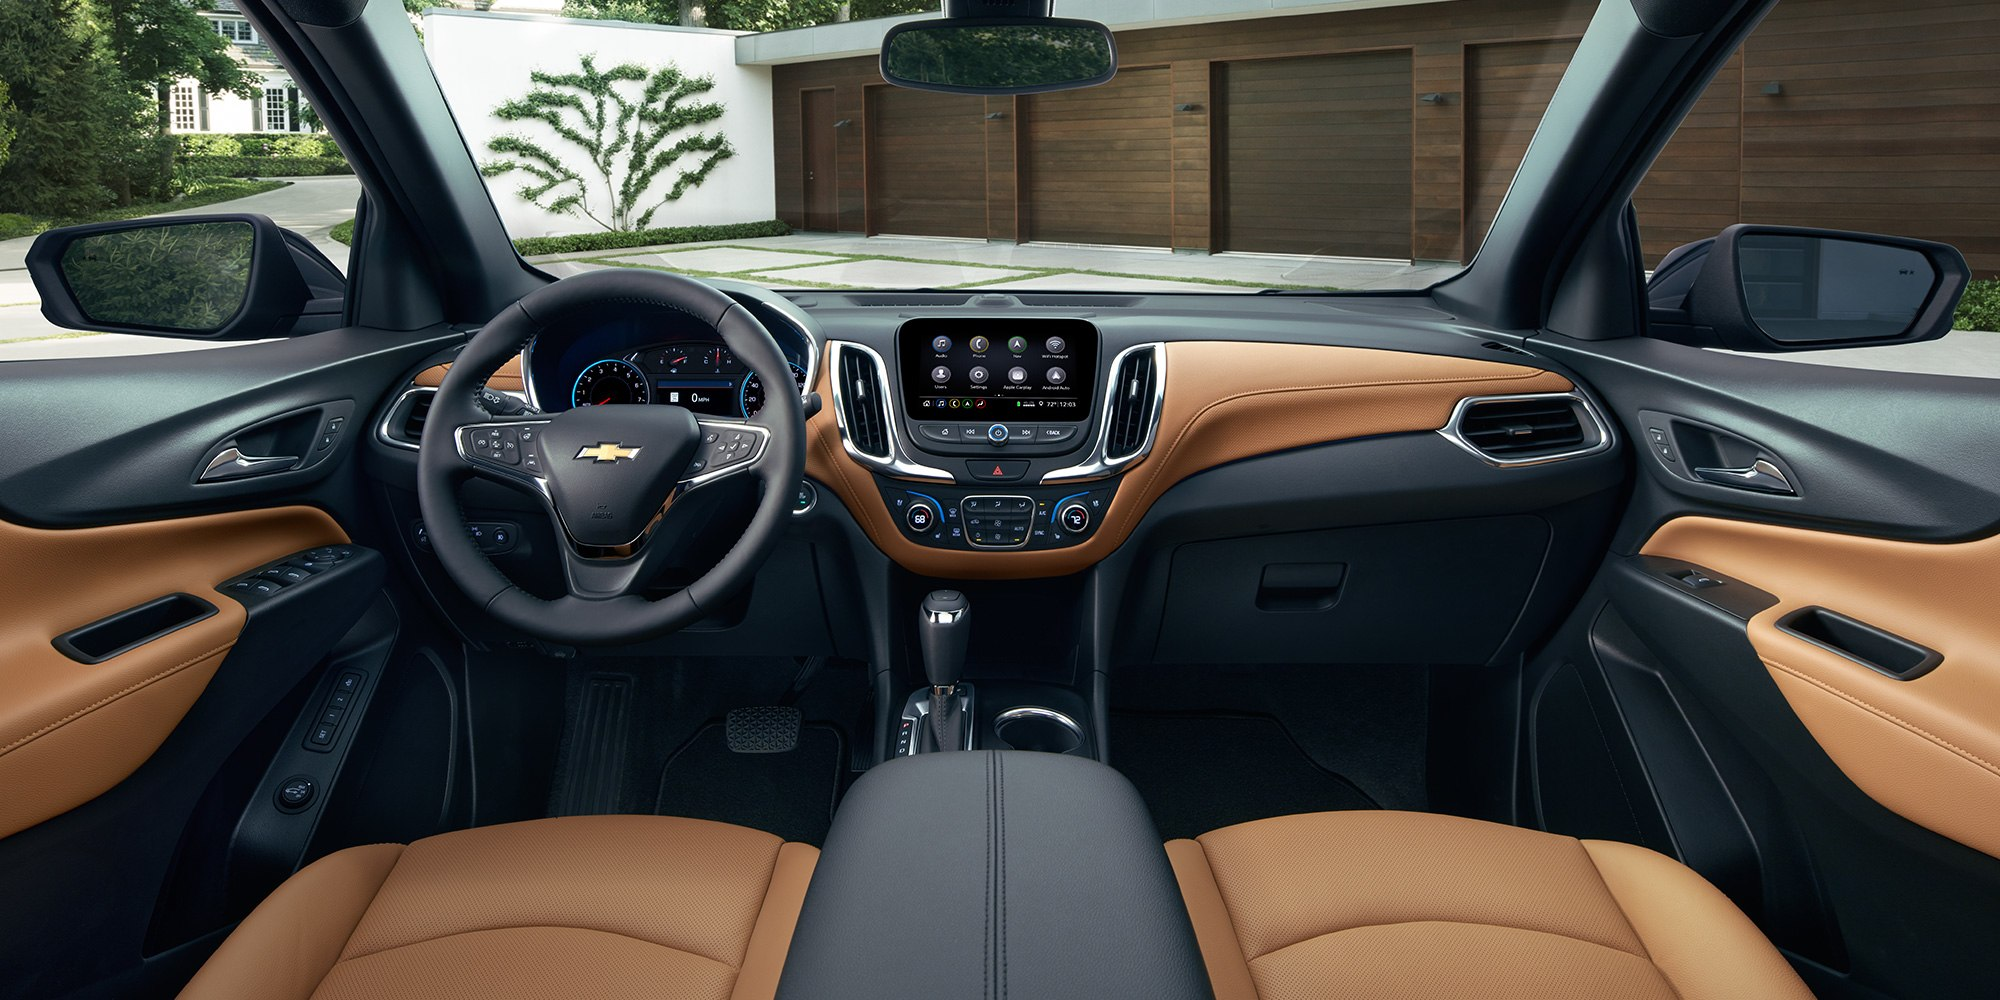 2019 Chevrolet Equinox Cockpit